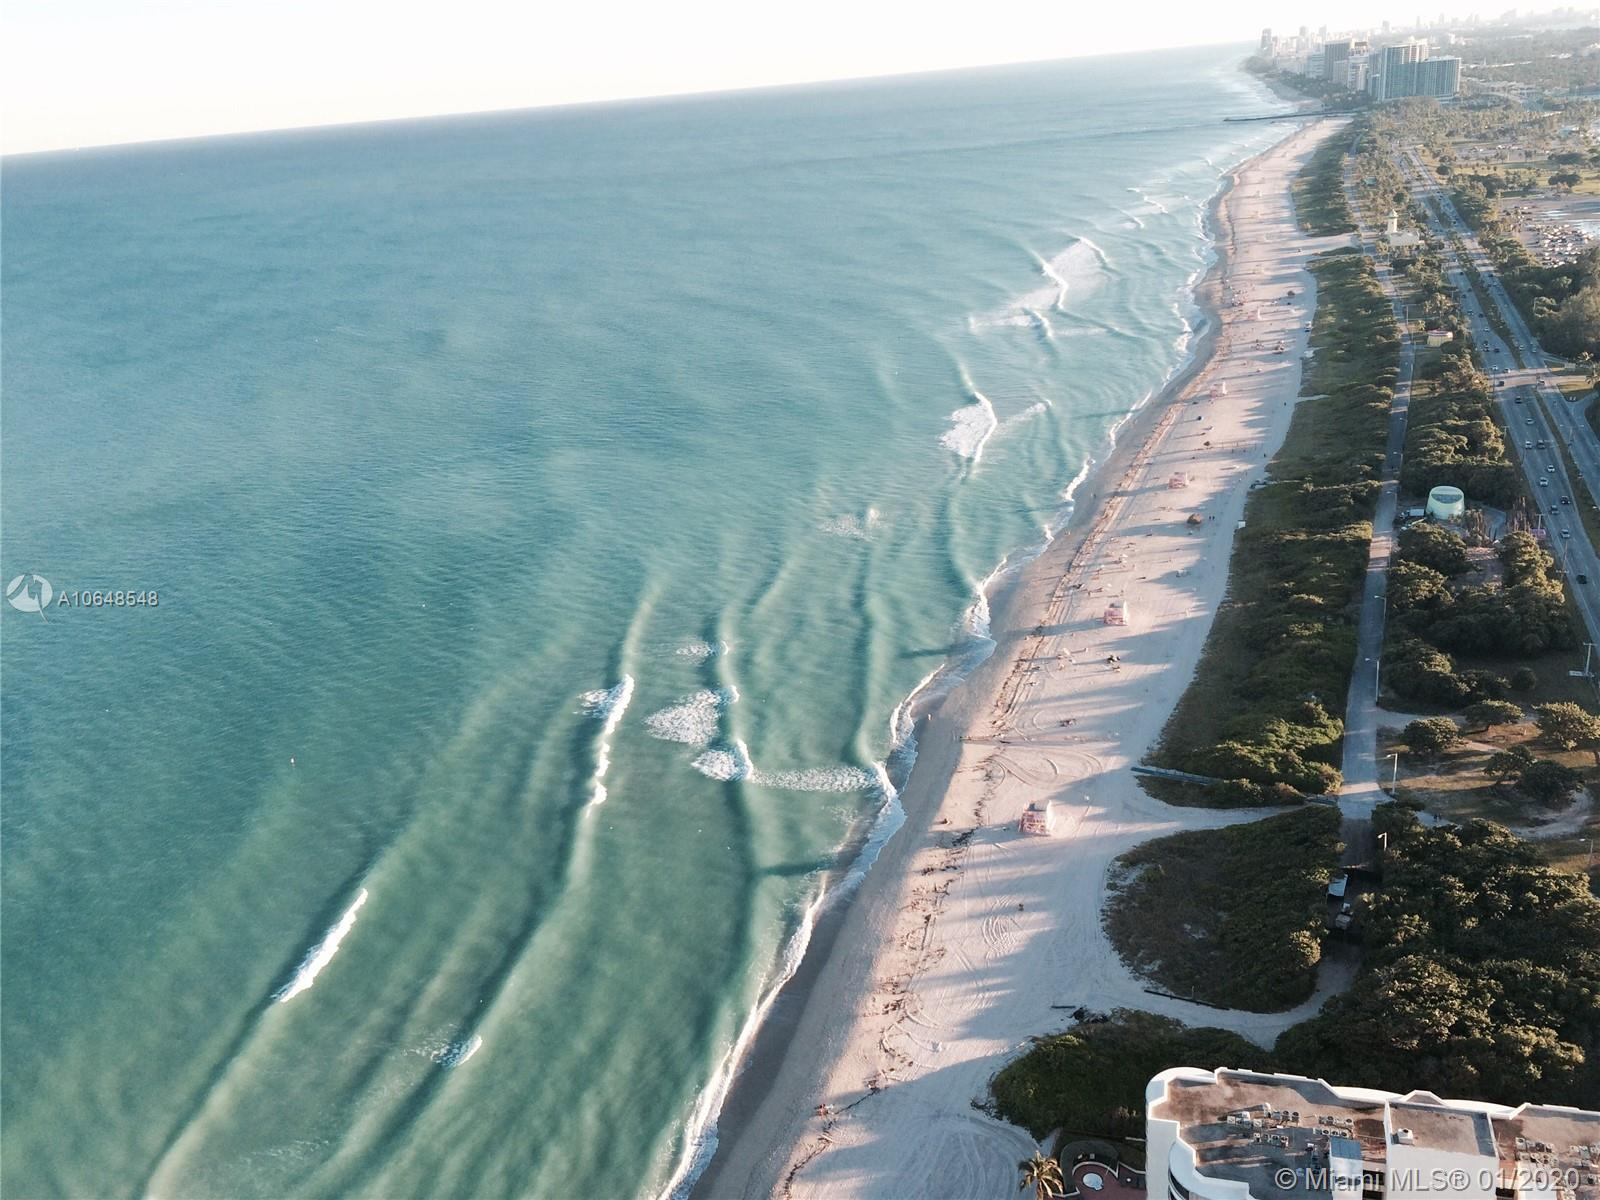 15811 COLLINS AV # 4202, Sunny Isles Beach, Florida 33160, 3 Bedrooms Bedrooms, ,4 BathroomsBathrooms,Residential Lease,For Rent,15811 COLLINS AV # 4202,A10648548